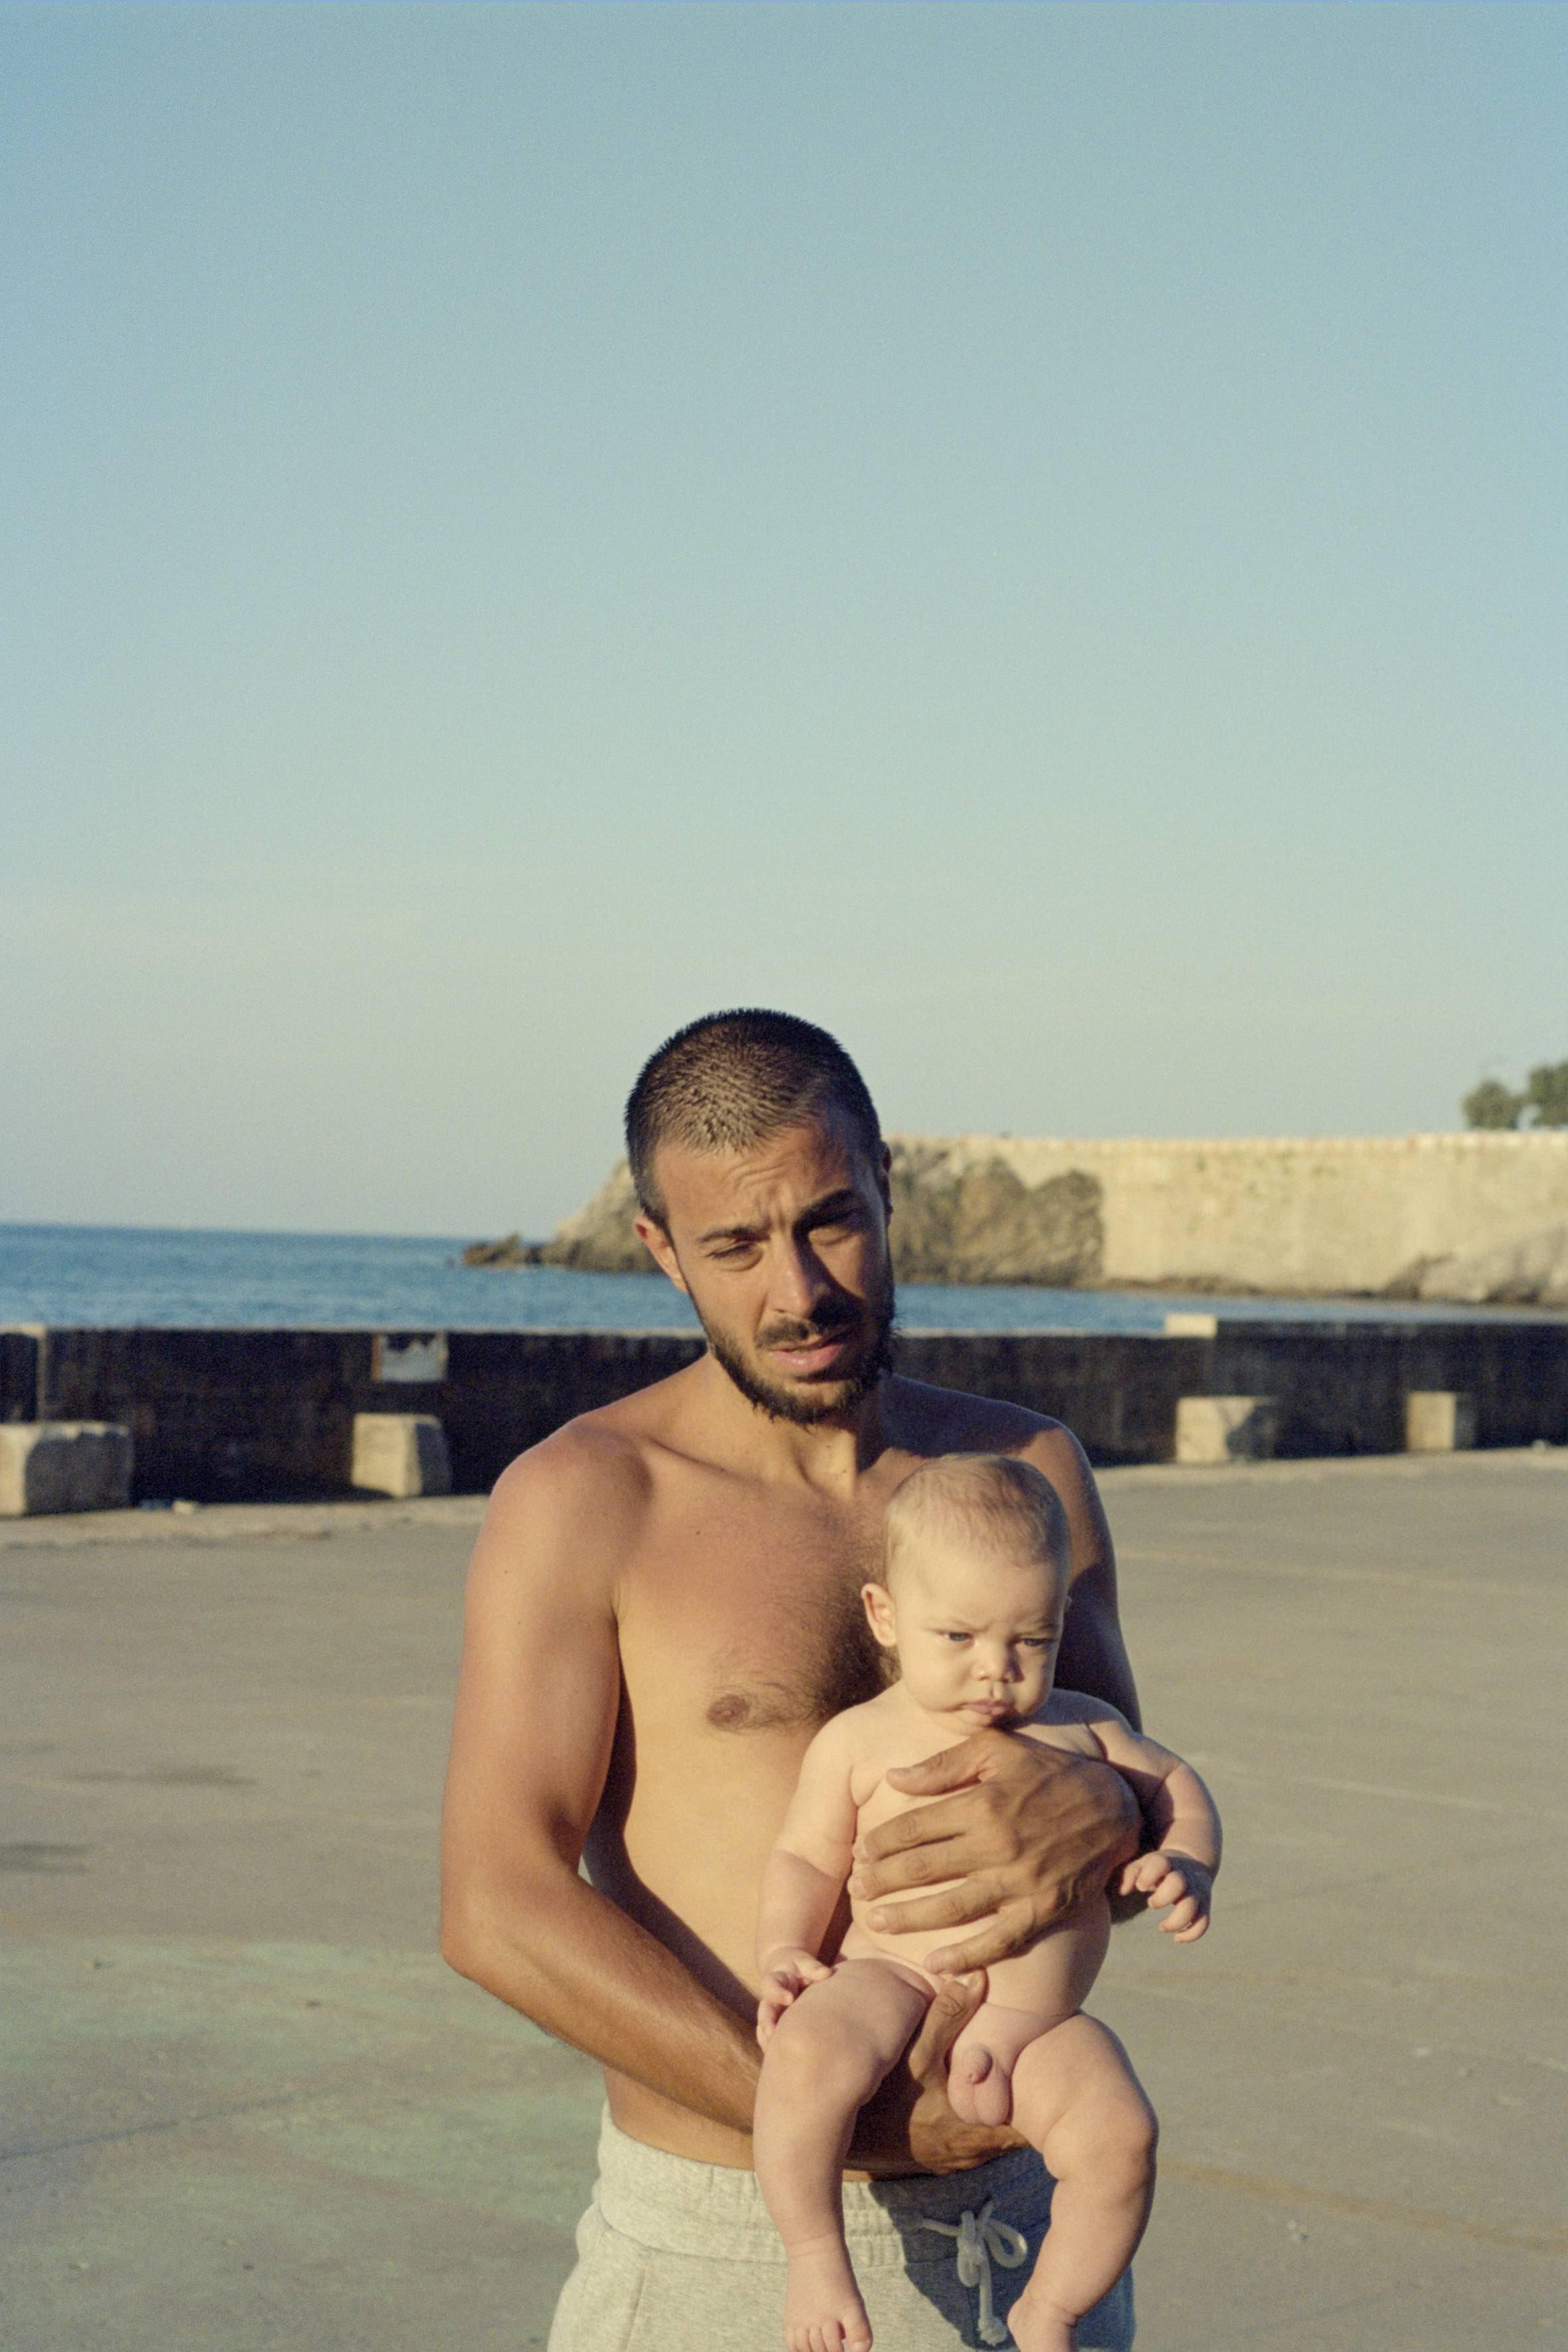 Project 'Roma', byt Bernardita Morello